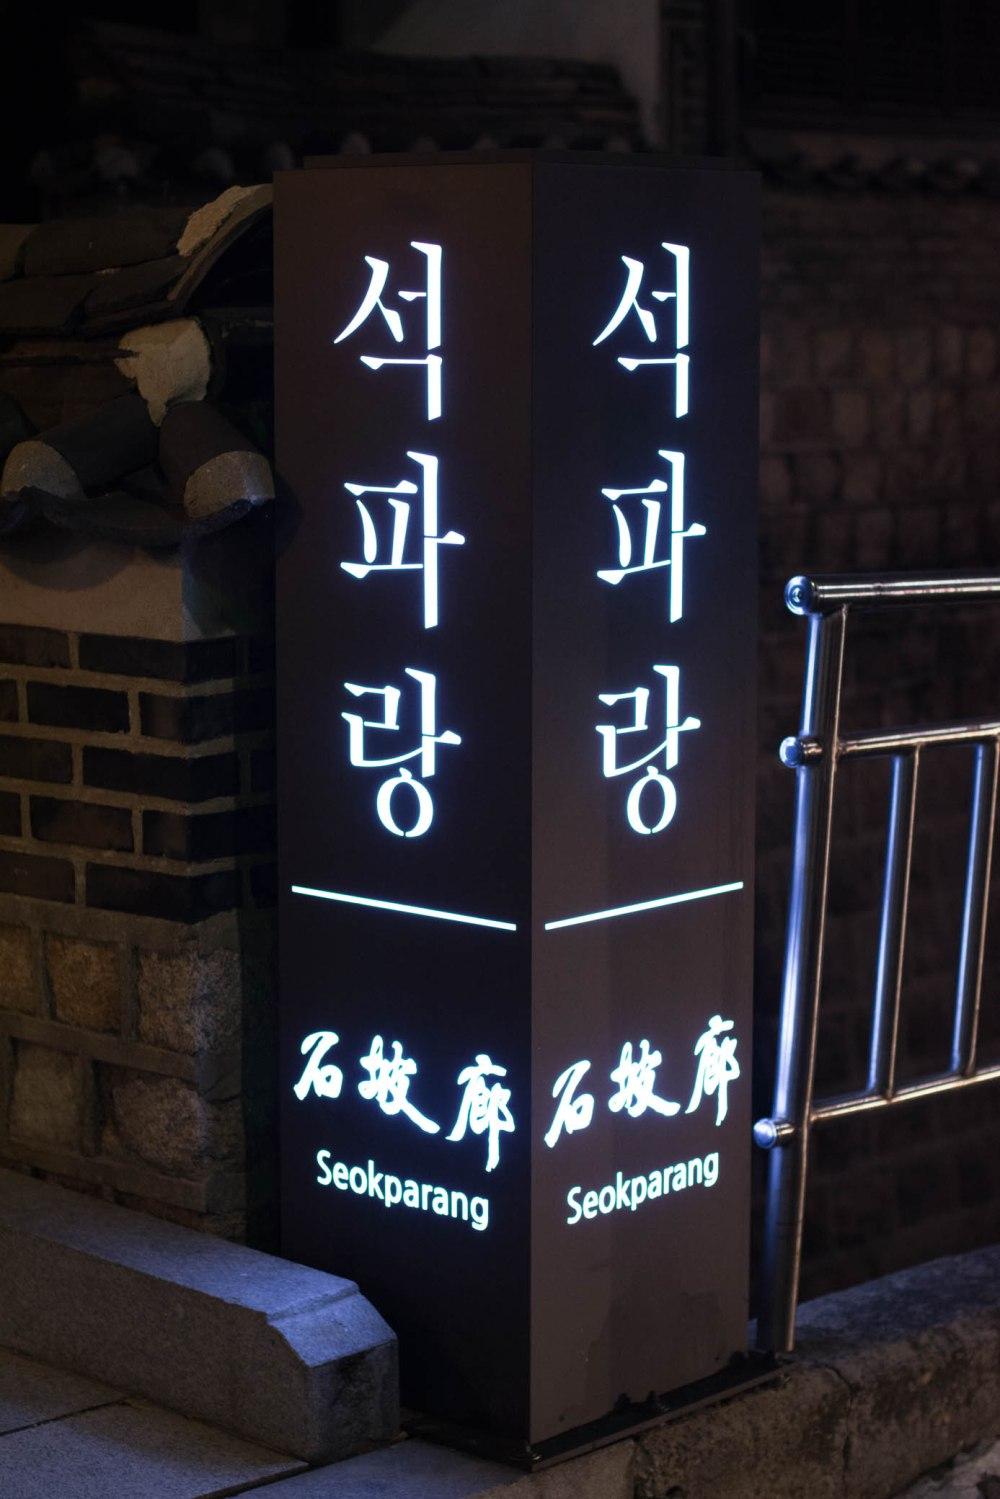 20130111- Seokparang00556